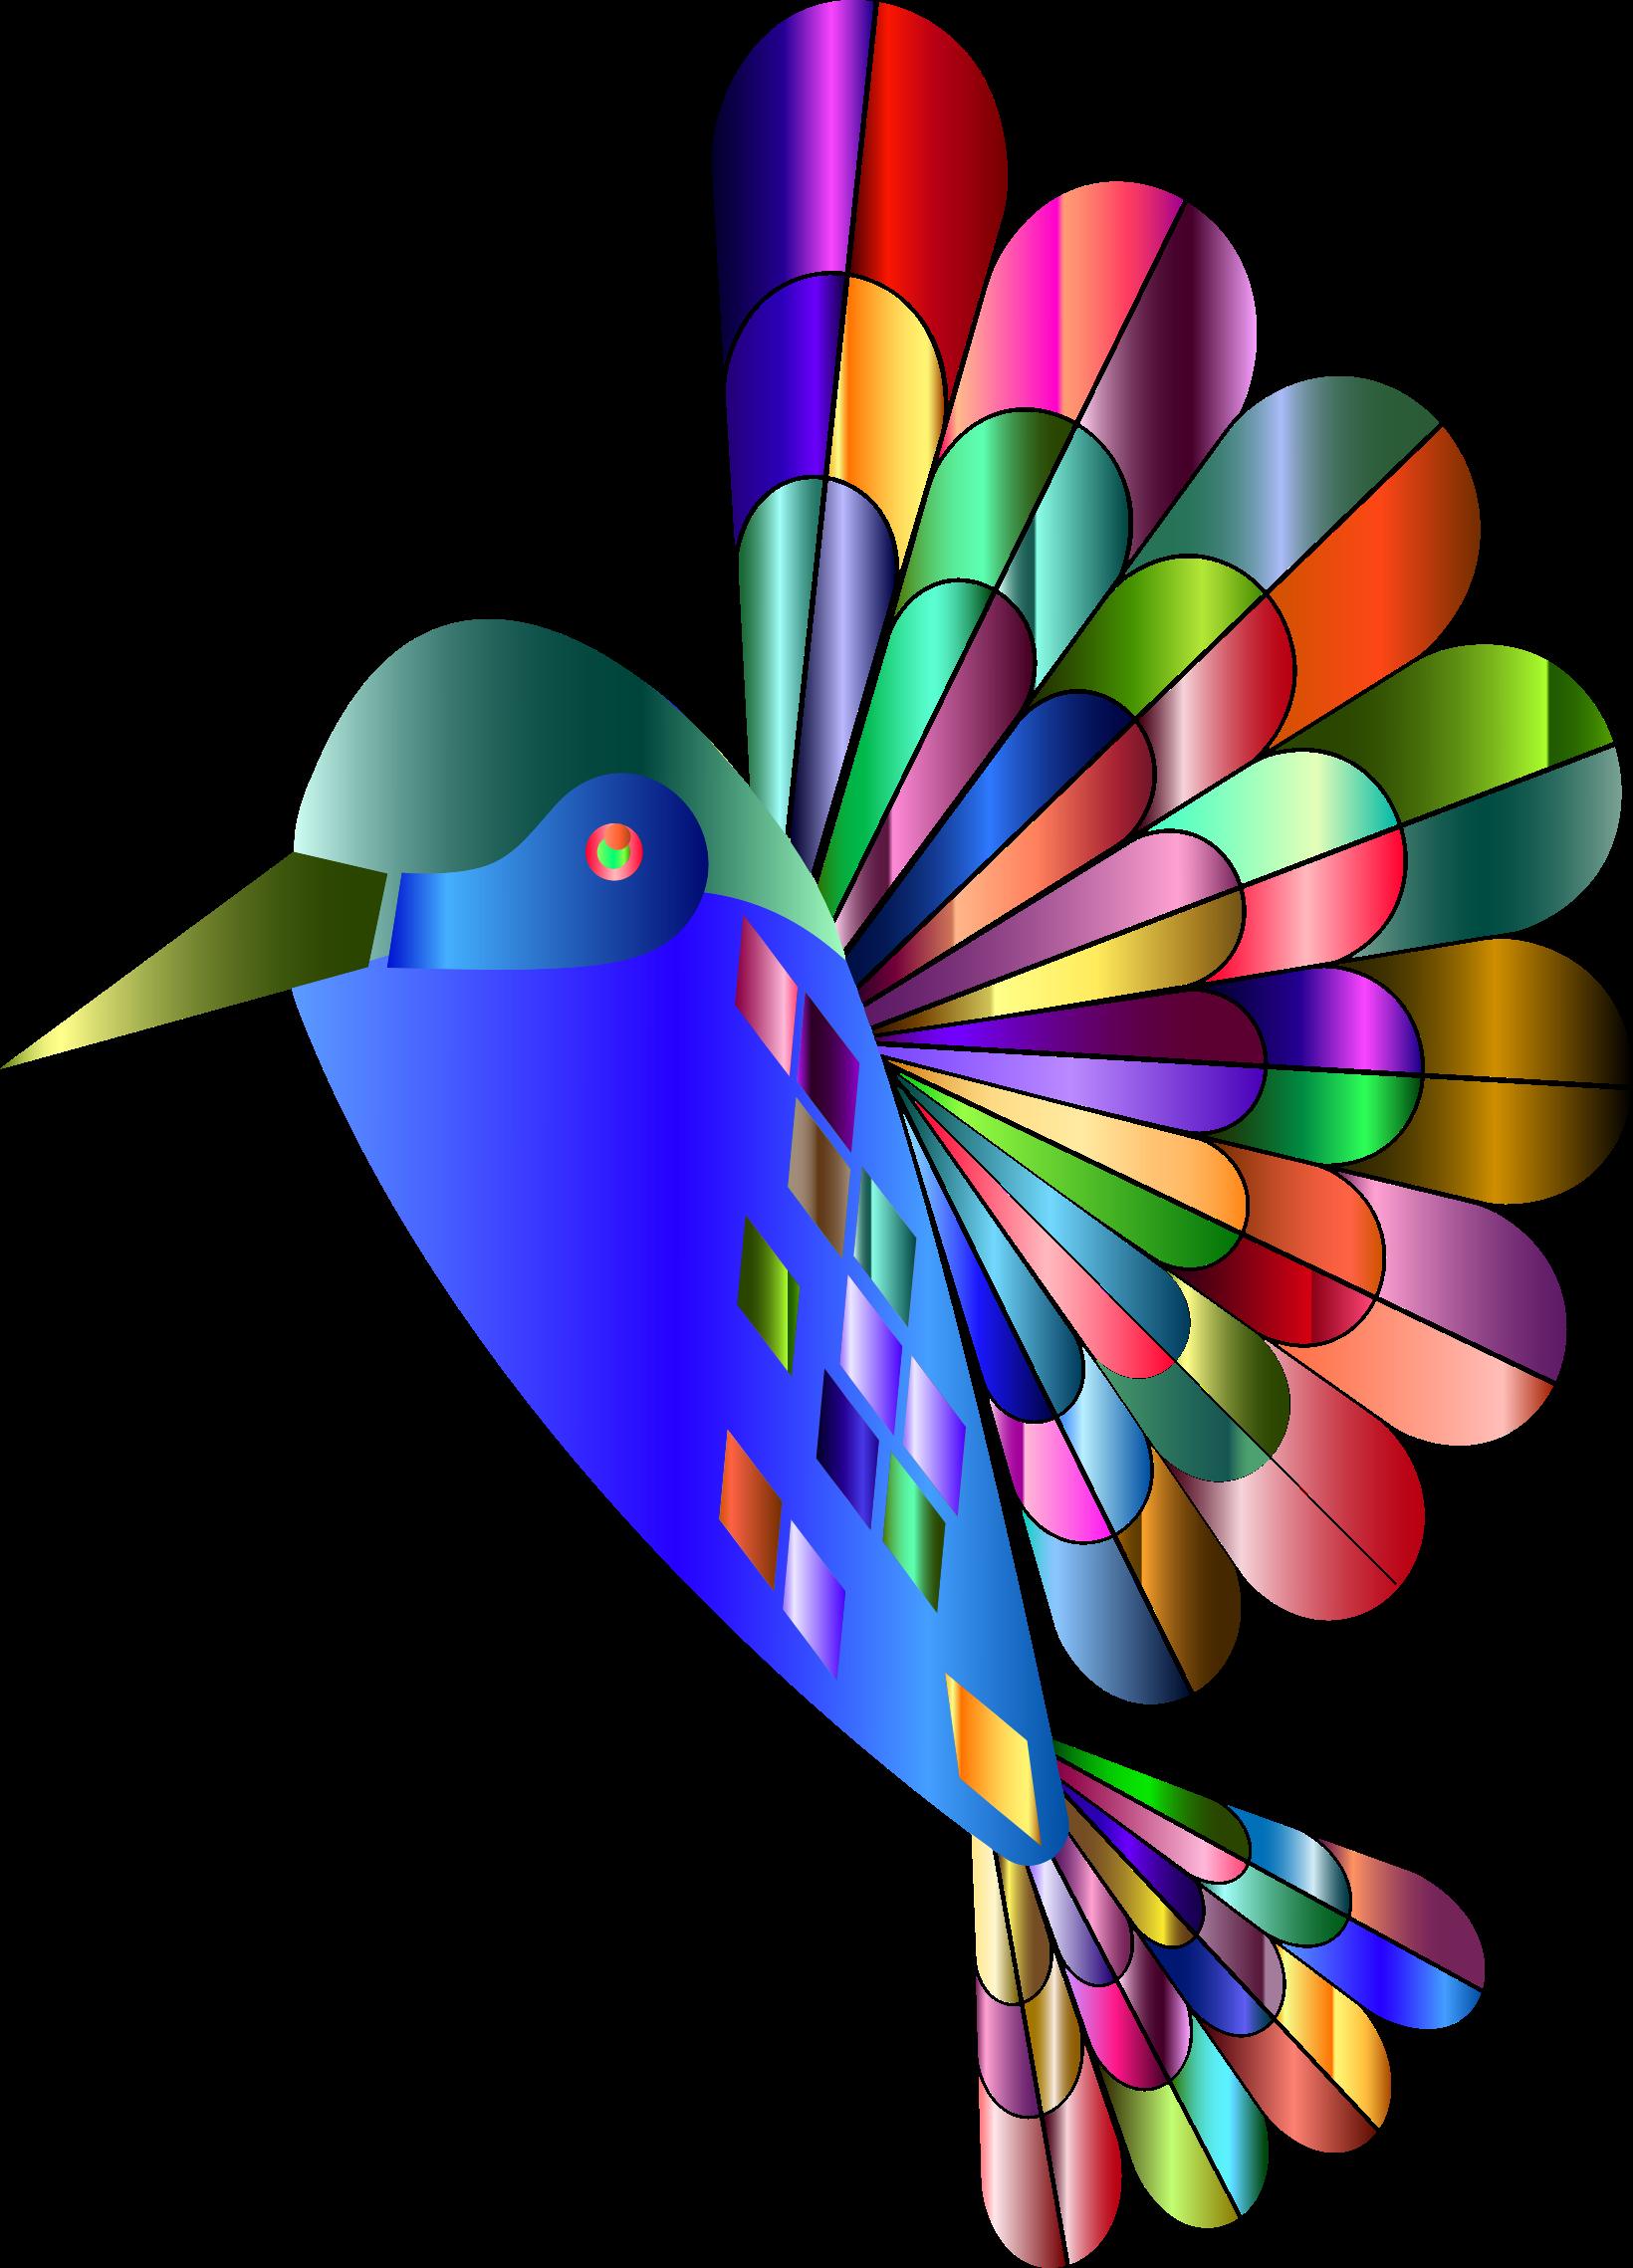 Hummingbird clipart clip art. Chromatic abstract big image